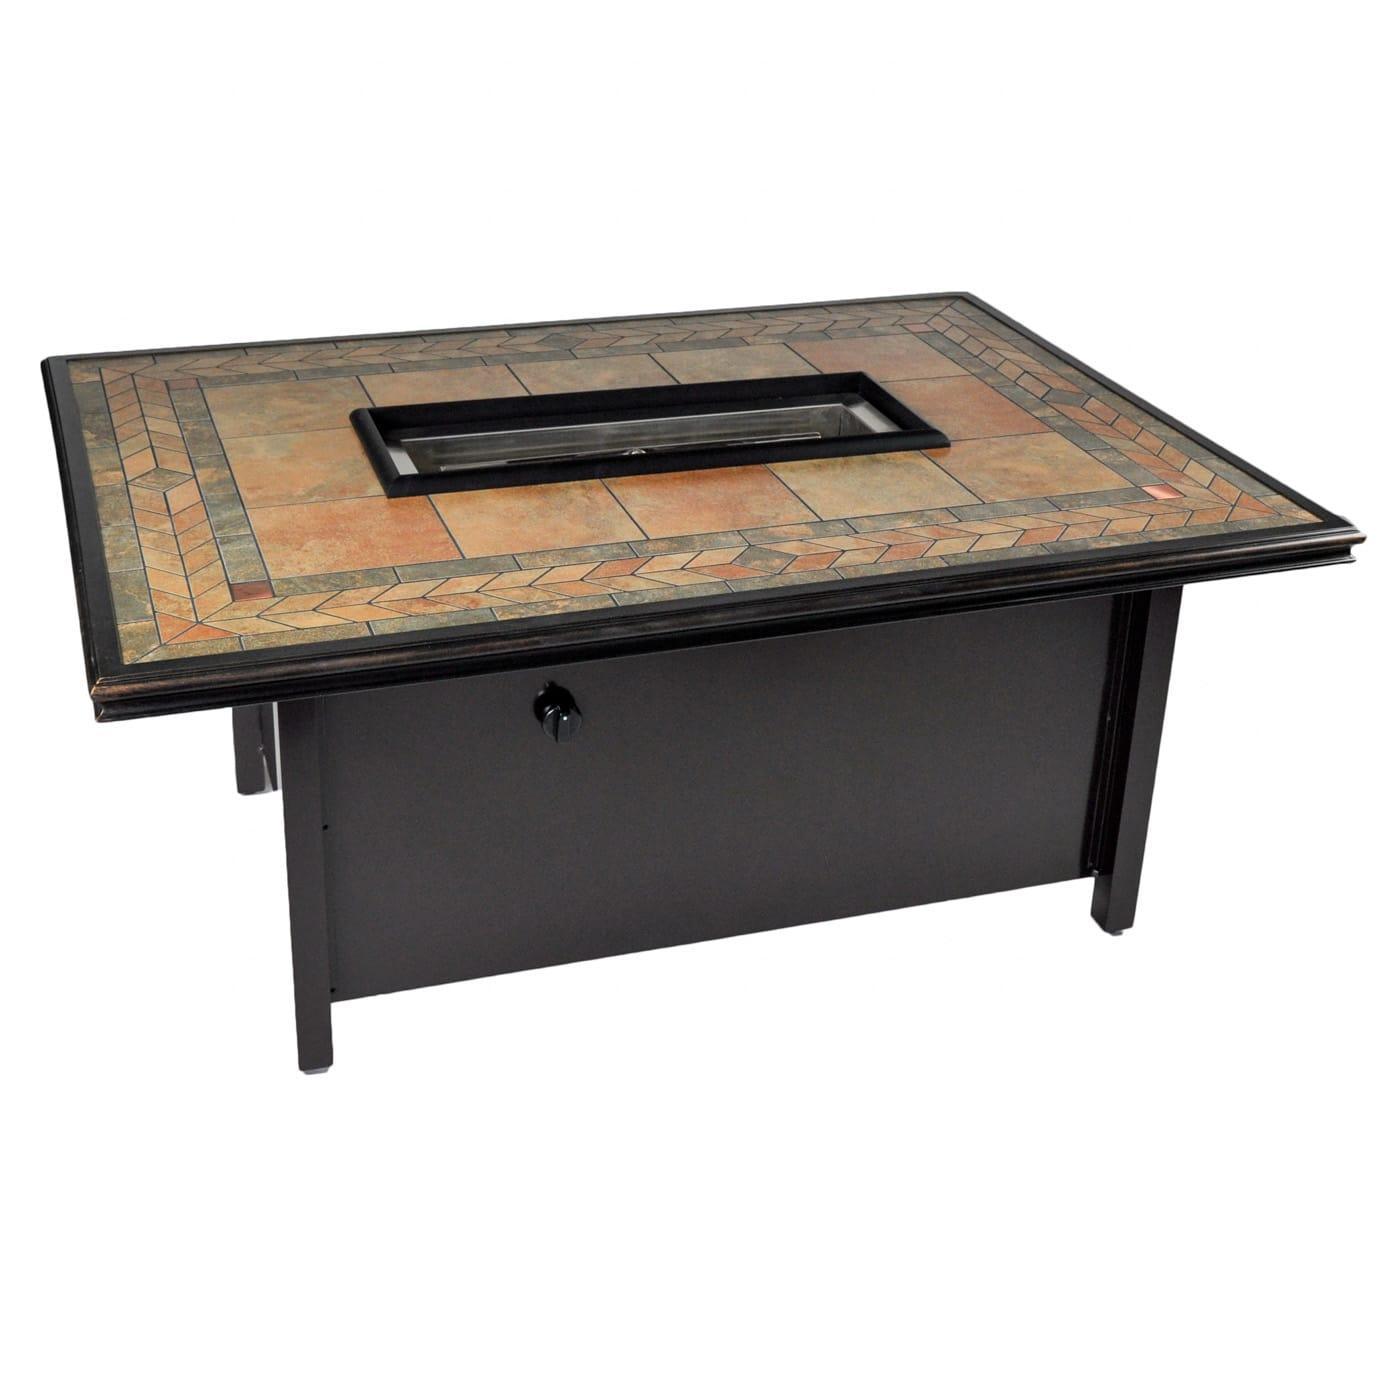 Tretco Panama 50 inch x 36 inch Fire Pit Table-Panama 50 inch x 36 pic 1.jpg